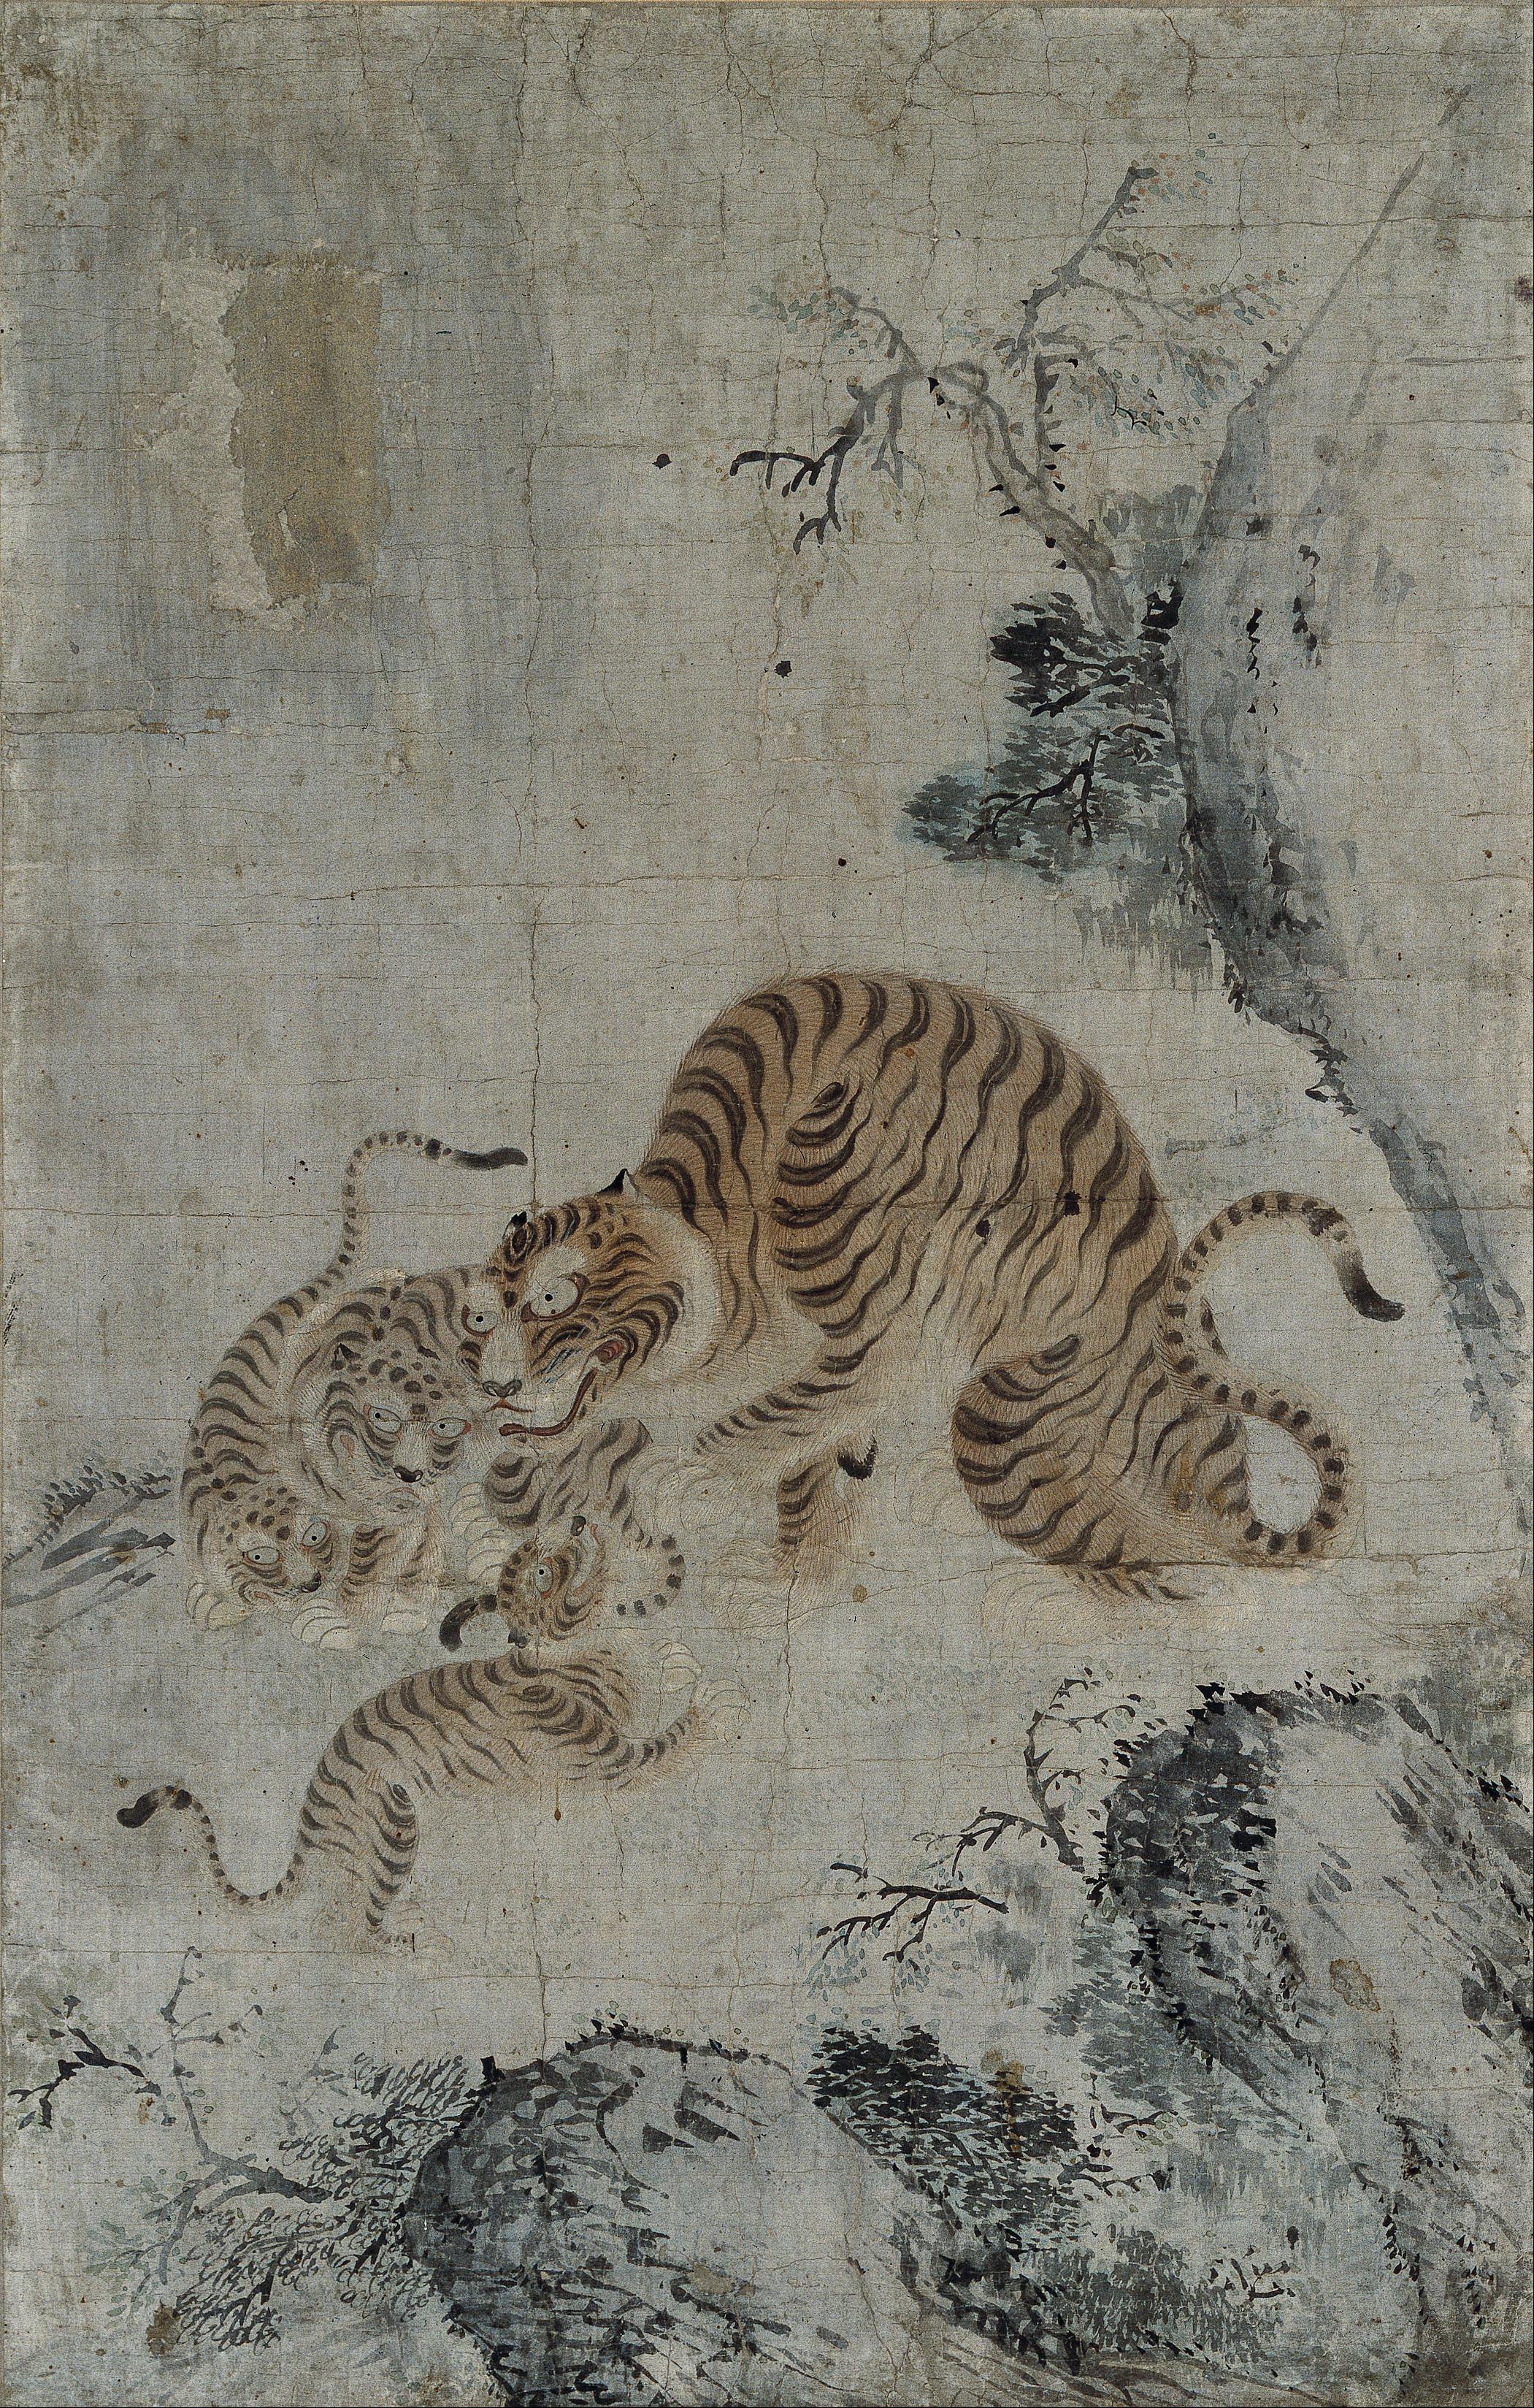 filekorea family of tigers google art projectjpg